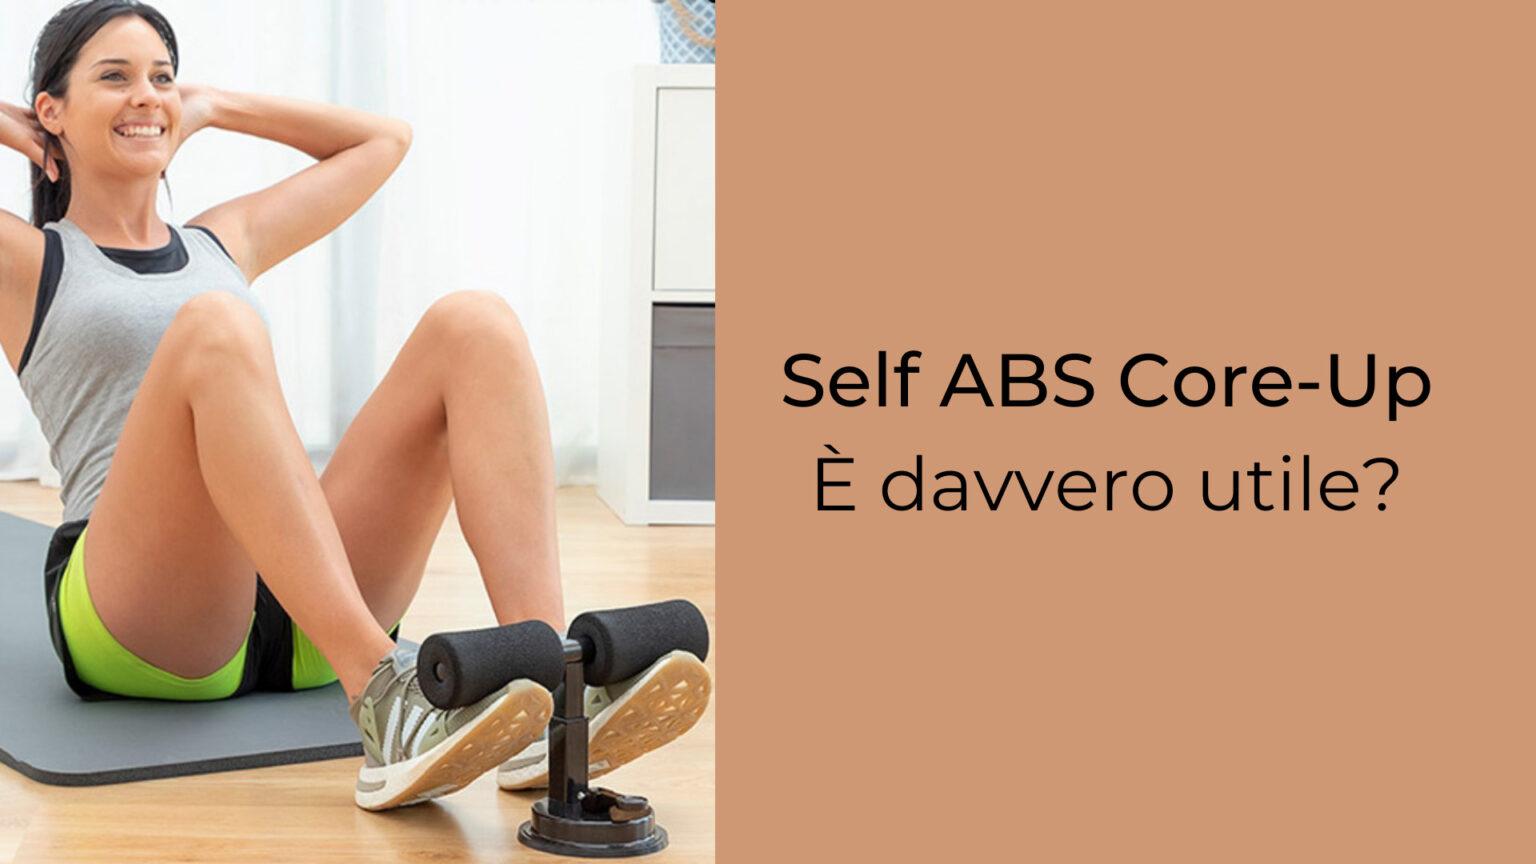 self ABS Core-Up è utile?